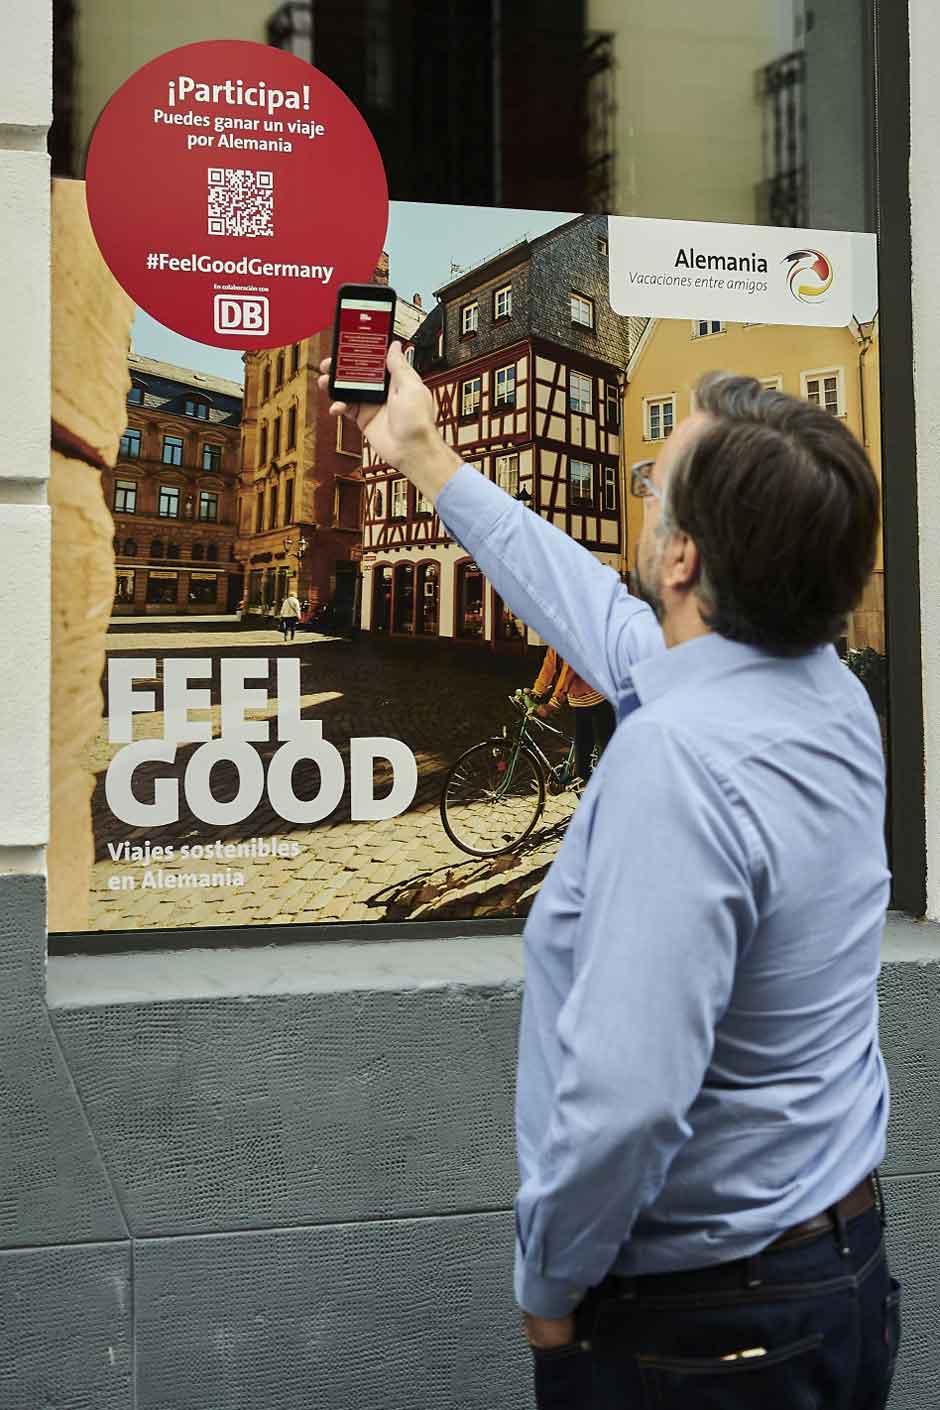   Ruta Malasaña Viajar Alemania ONAT Feel Good Tu Gran Viaje